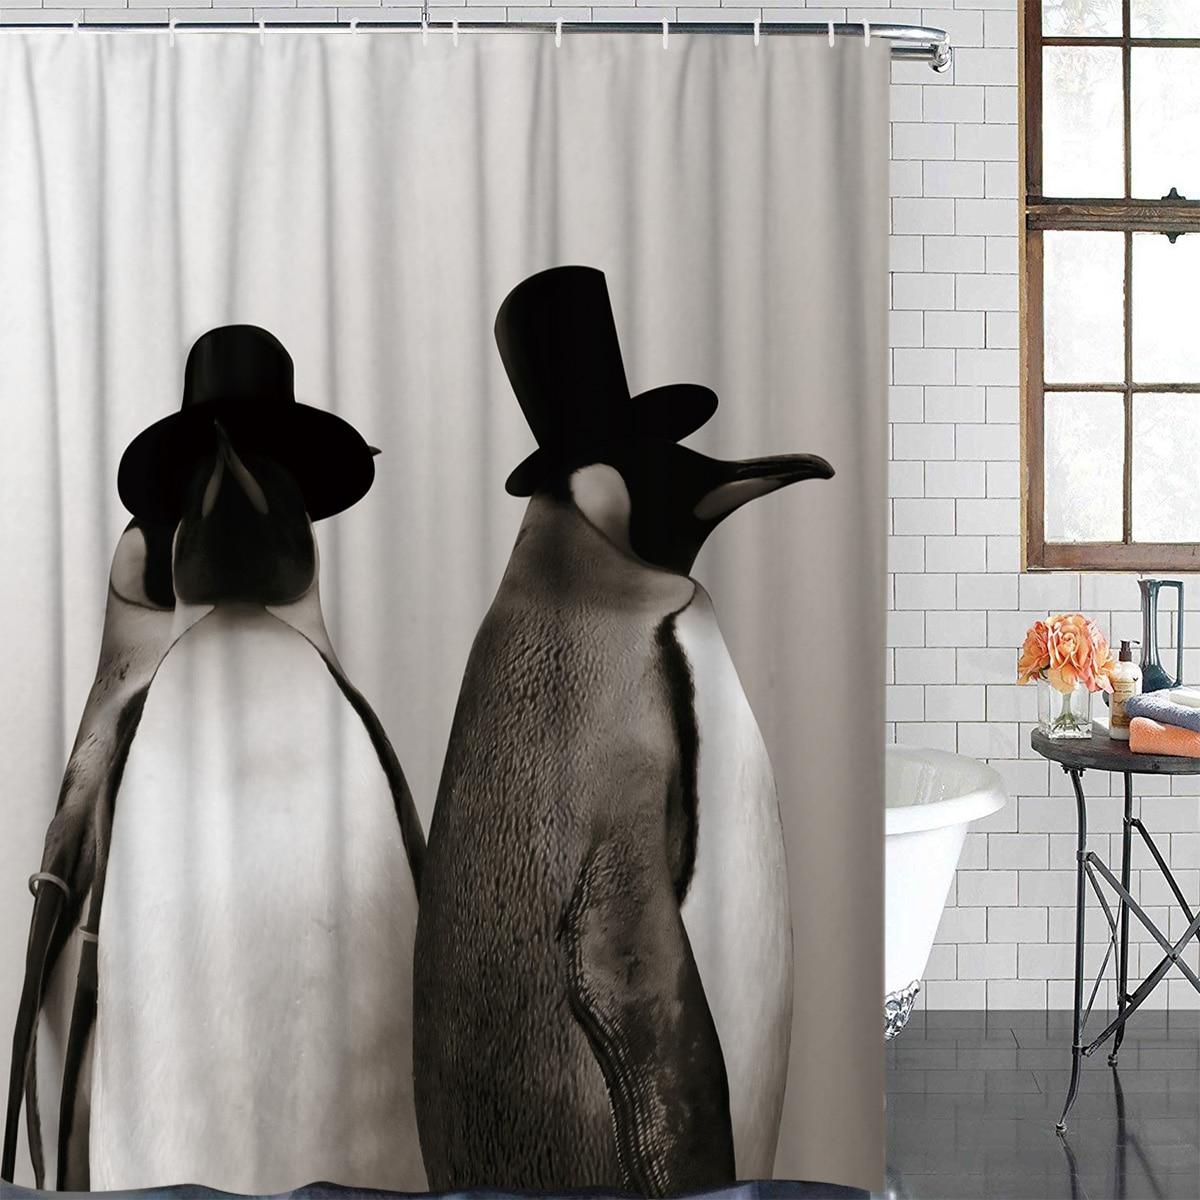 Cortina de ducha impermeable de tela de poliéster tema Animal lindo pingüino Primer plano Cortina de ducha